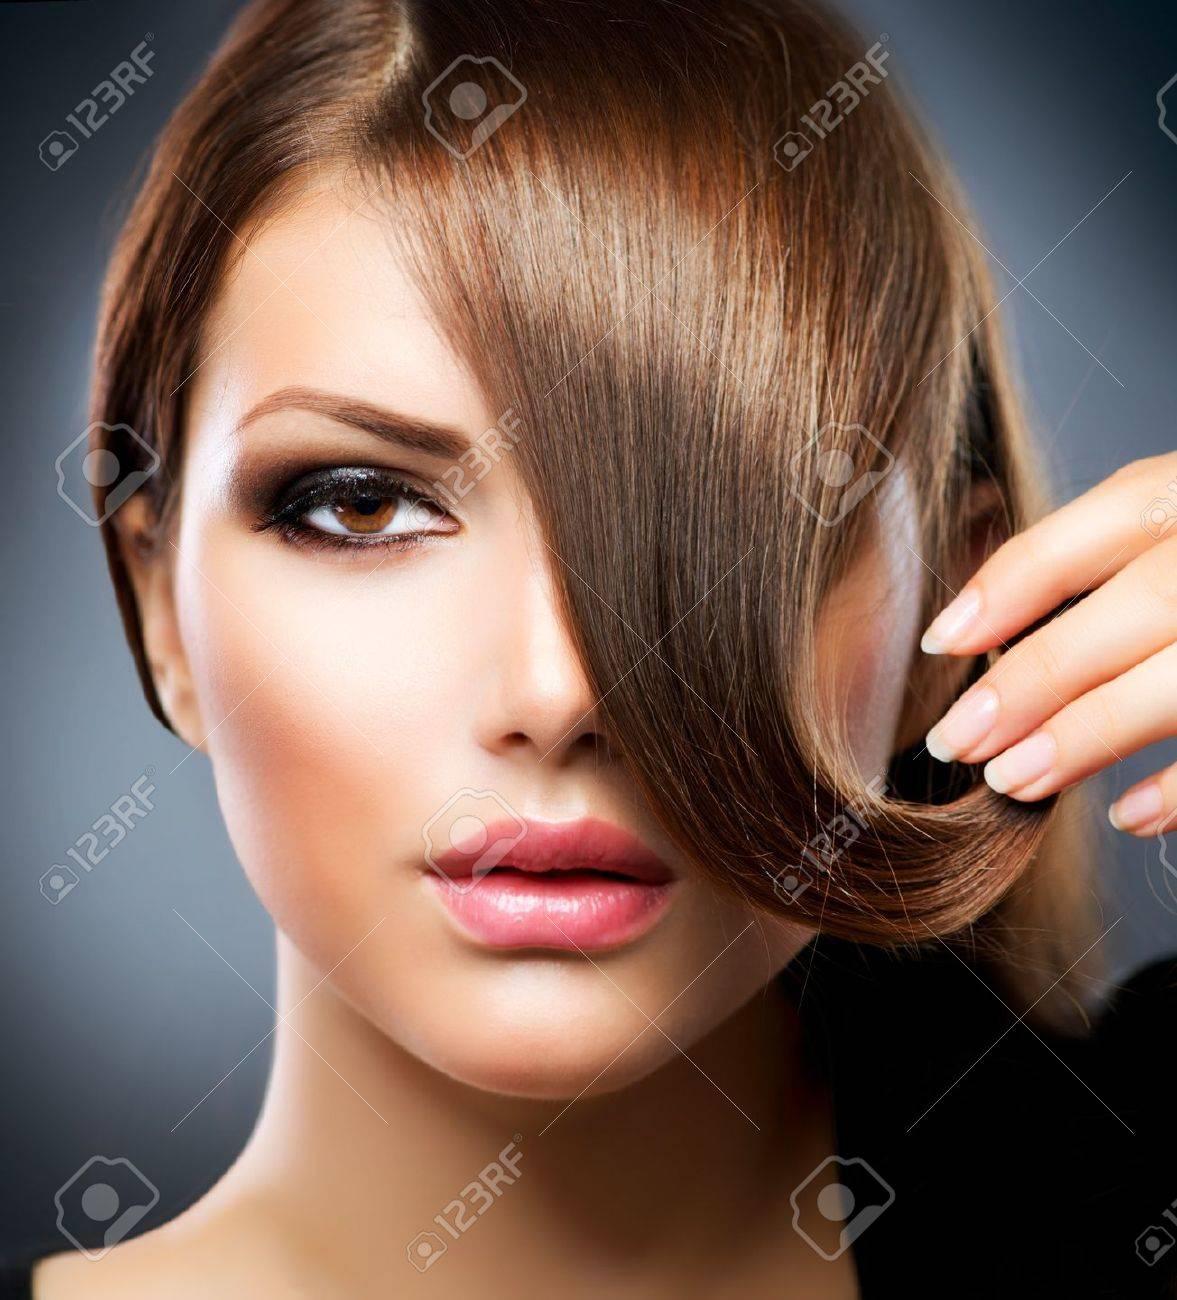 Hair Beauty Girl With Healthy Long Brown Hair - 14646687